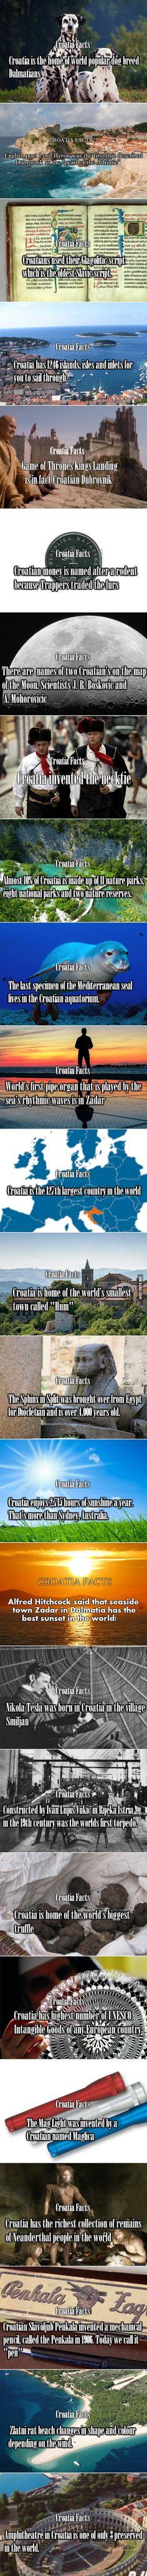 Fun facts about Croatia